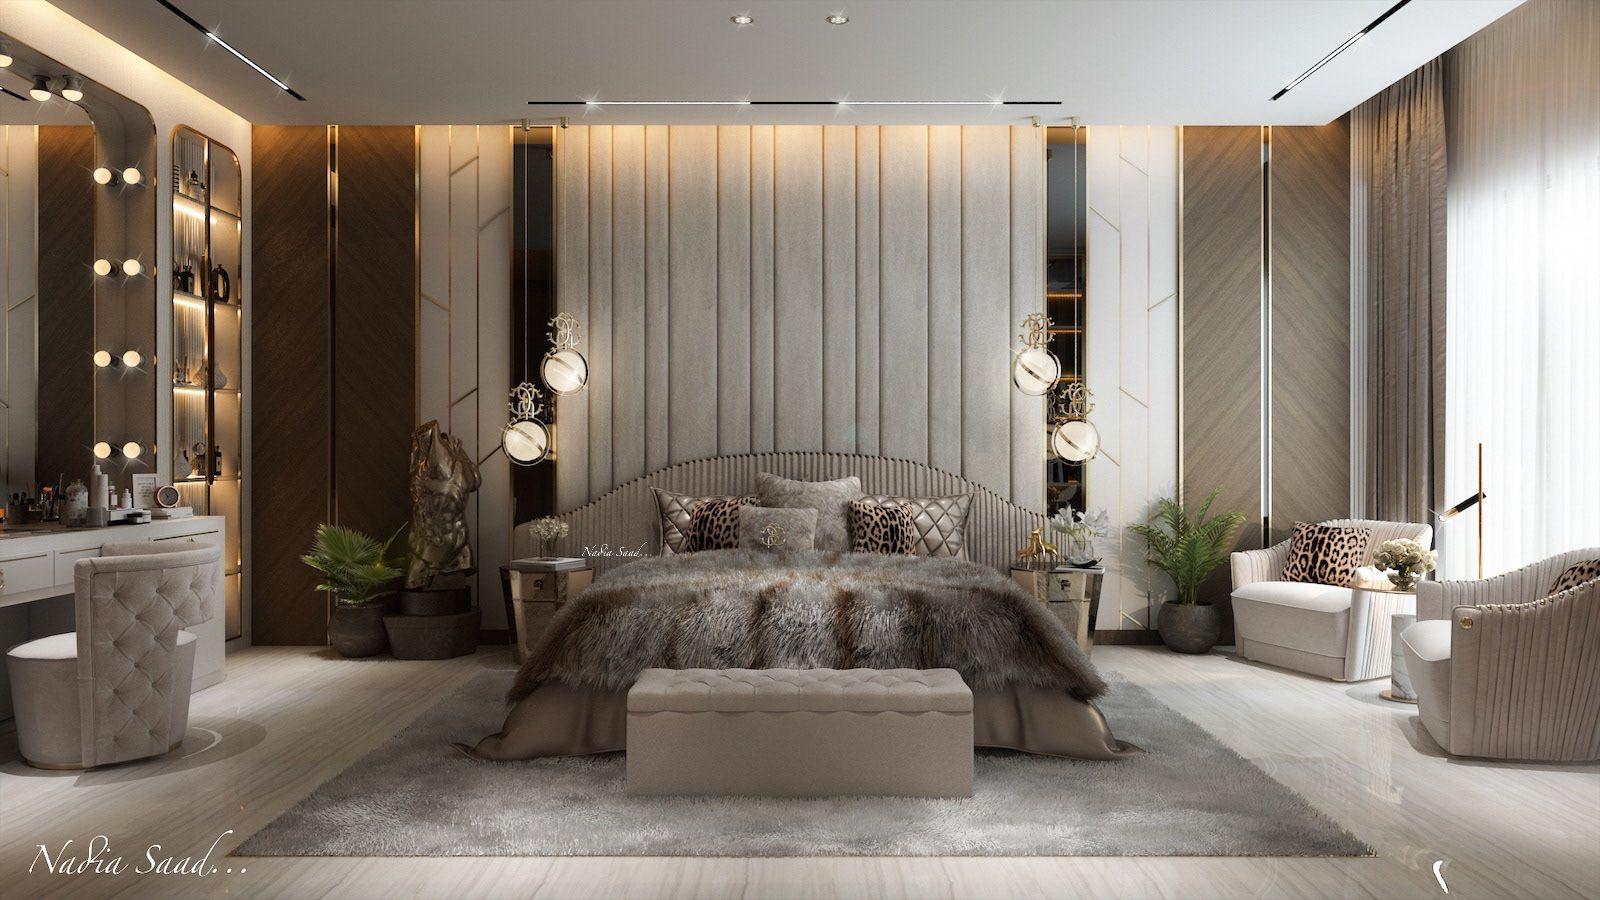 Master Bedroom Design In Ksa Private Villa On Behance Luxury Master Bedroom Design Master Bedroom Interior Design Luxury Bedroom Master Luxury master bedroom example